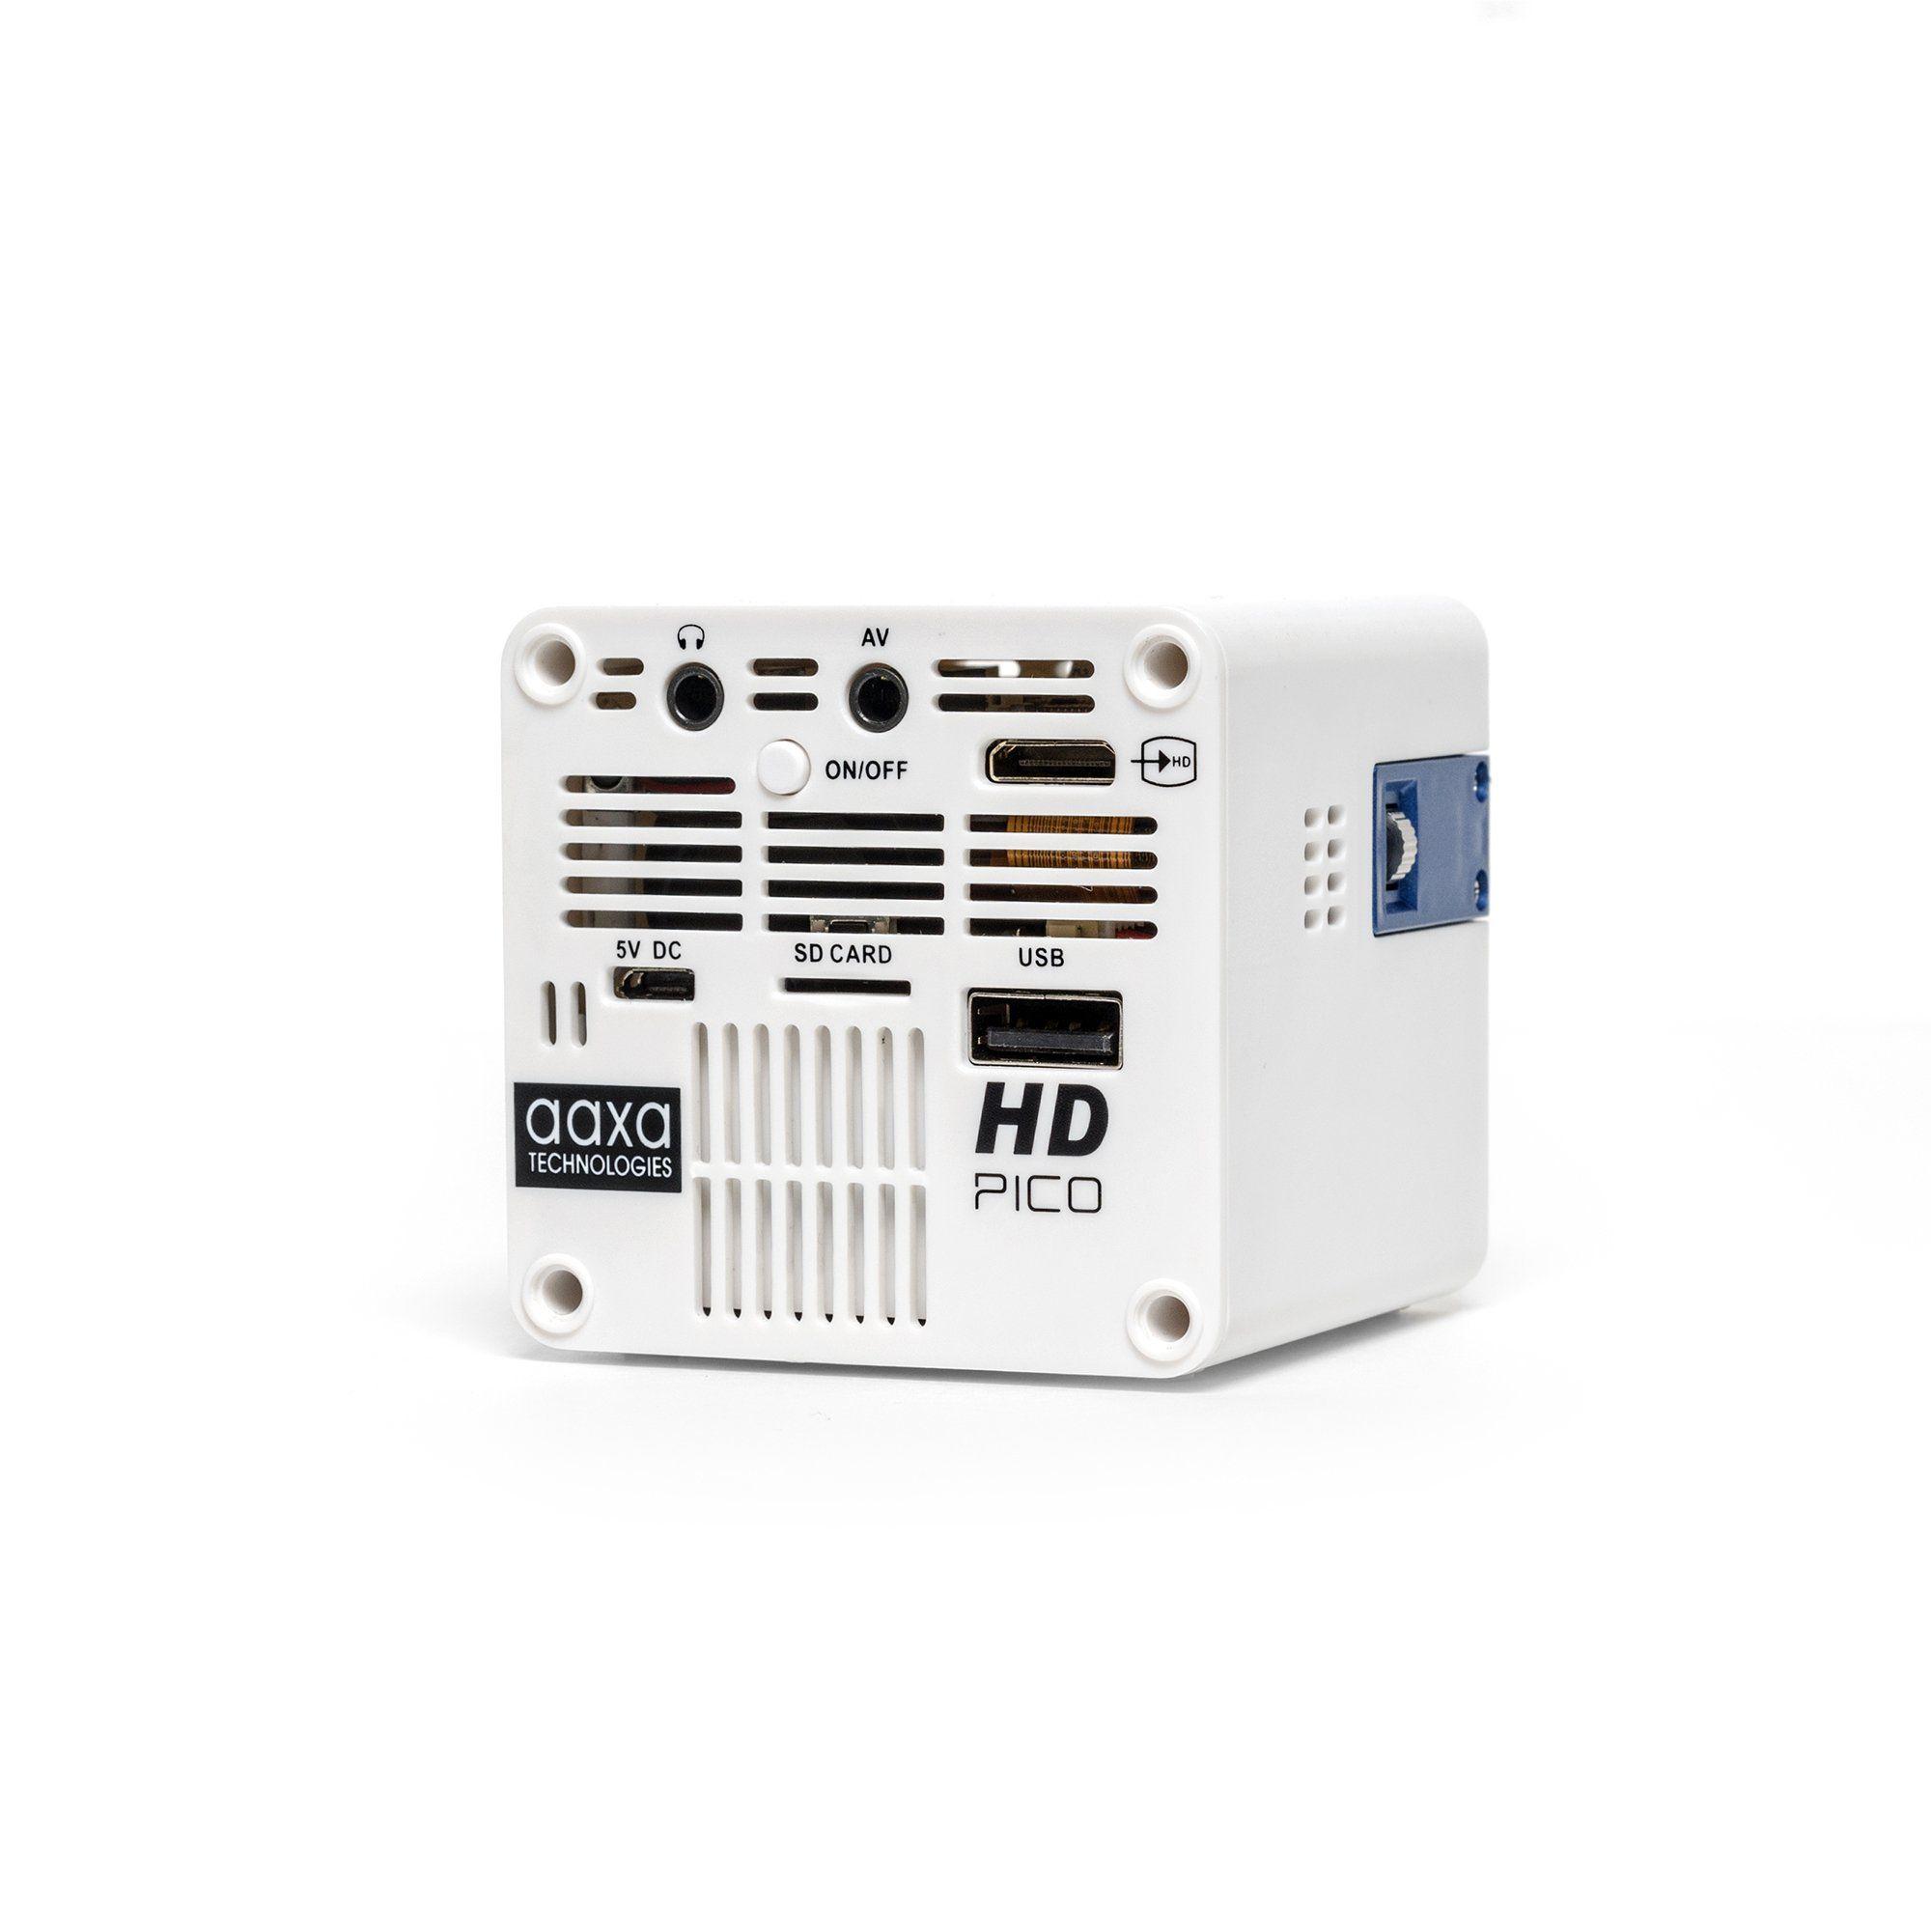 AAXA HD Pico Mini LED Projector with 150Minute